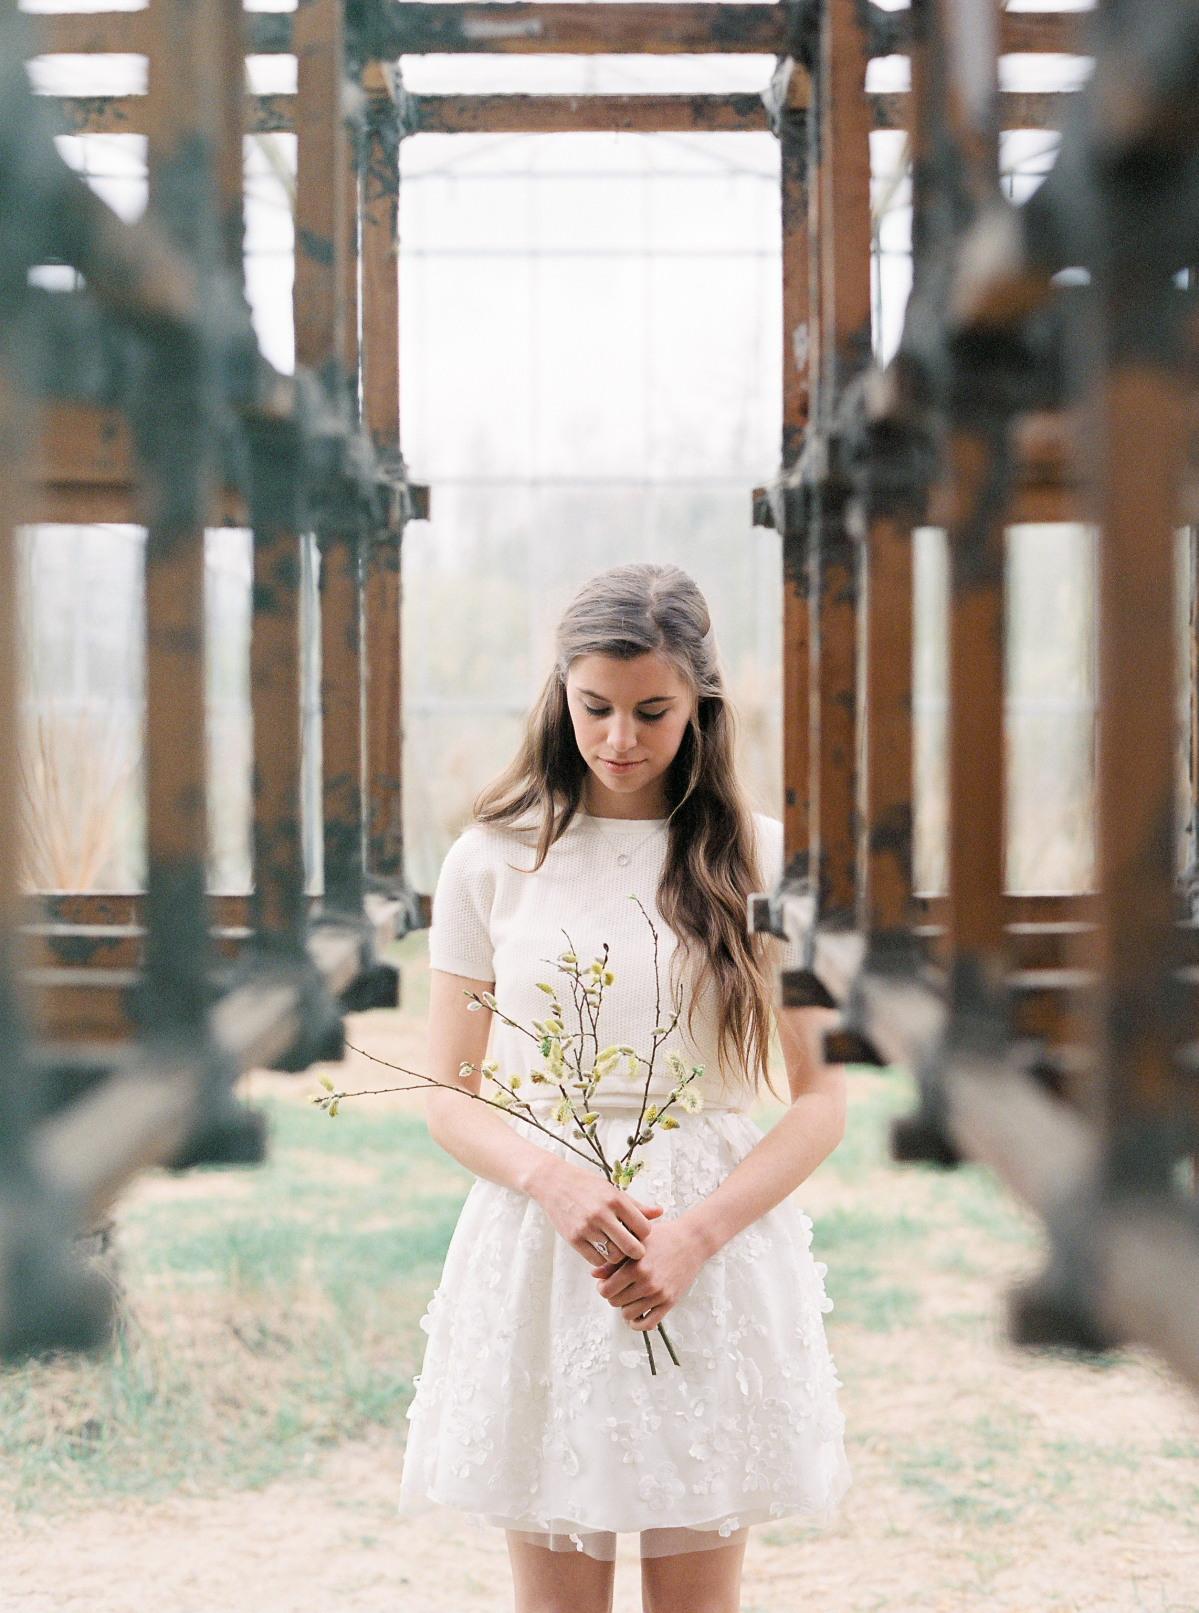 Lucy_Davenport_Photography_Madame_Seguin-050valentine-avoh